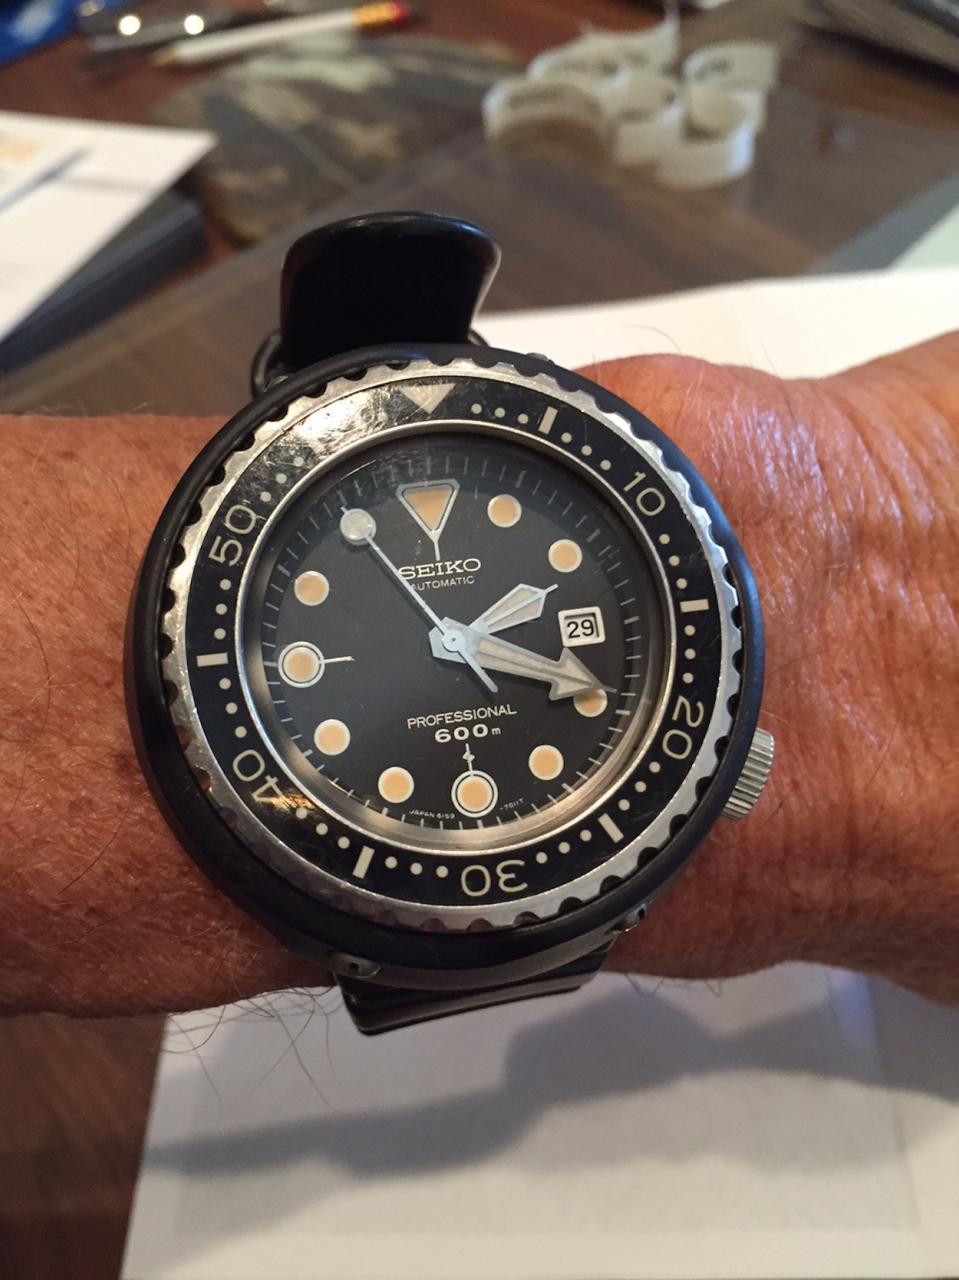 Seiko 6159 Tuna on the wrist